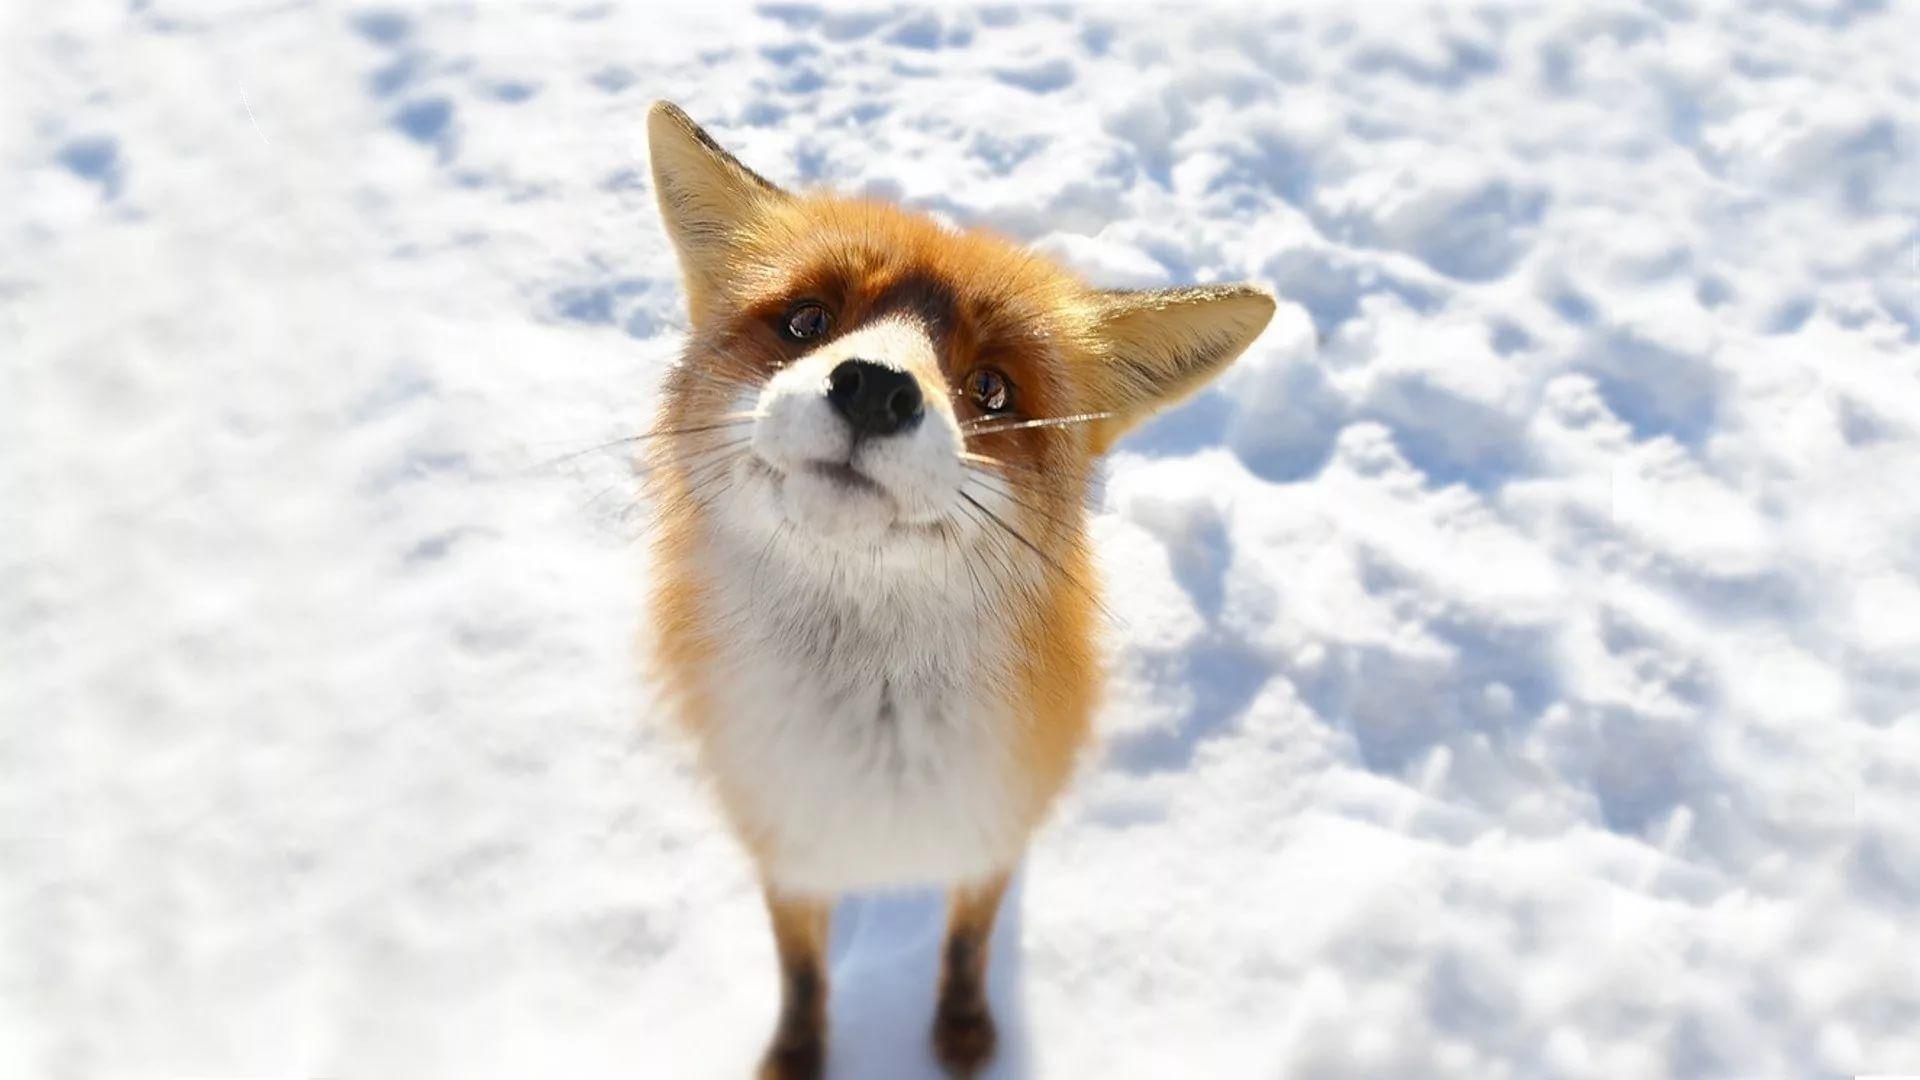 Cute Winter wallpaper photo